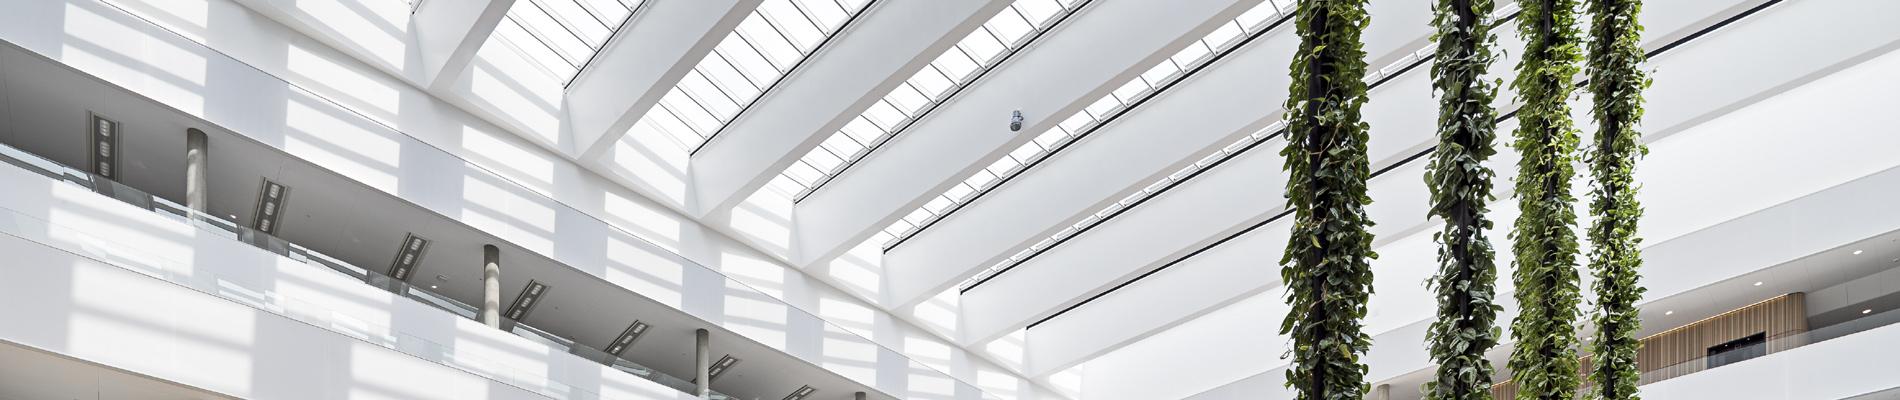 VELUX Modular Skylight – Atrium Dachverglasung